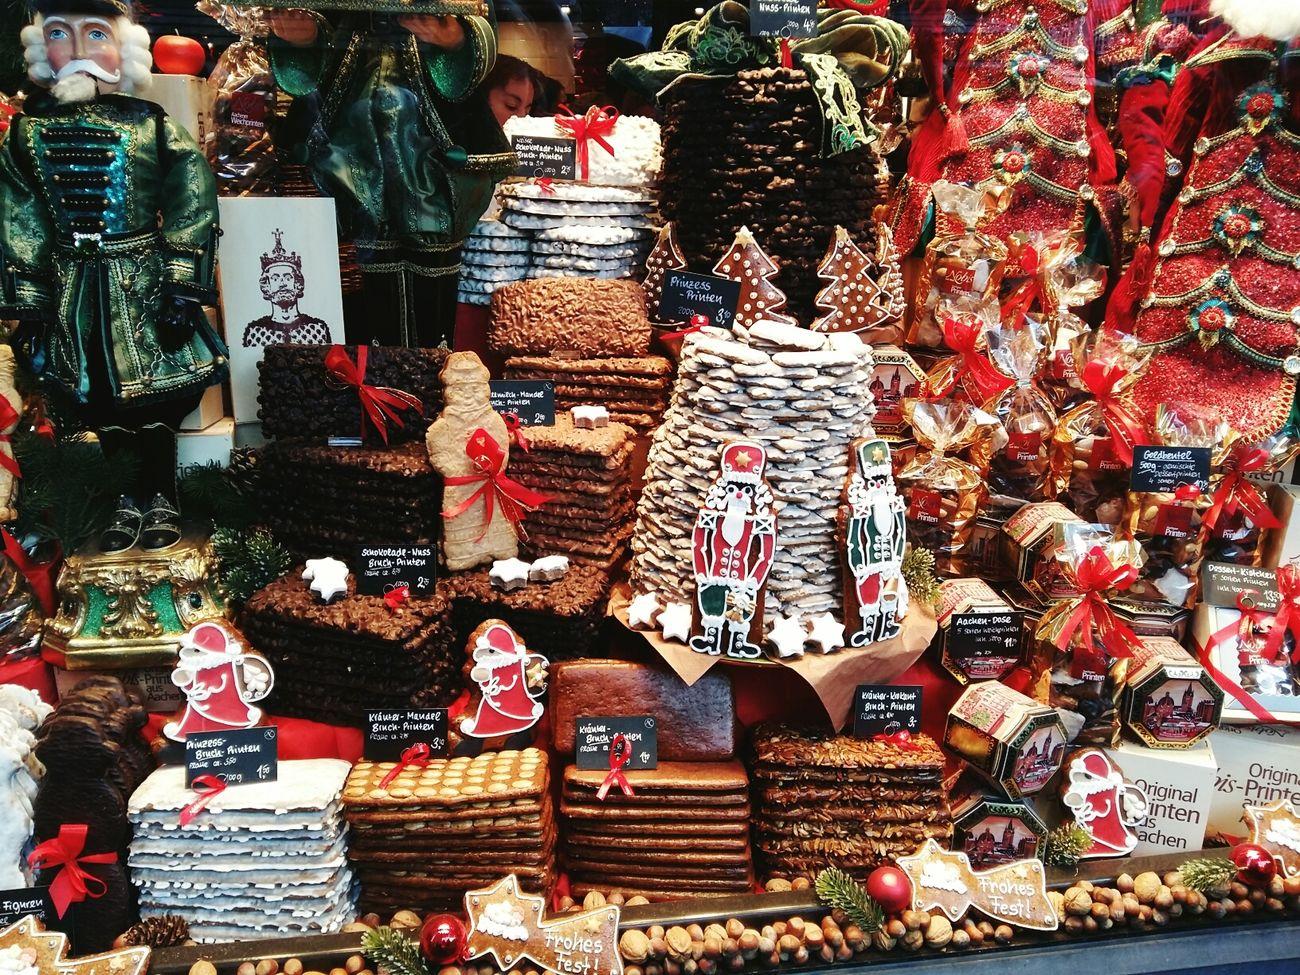 in Aachen Aachener Dom Printen Aachener Markt Aachener Printen Christ Christmas Lights Christmas Time Christmas Decorations Christmasspirit Candy Store Karl Der Große Imagine 2015  Love Wonderful Wintertime